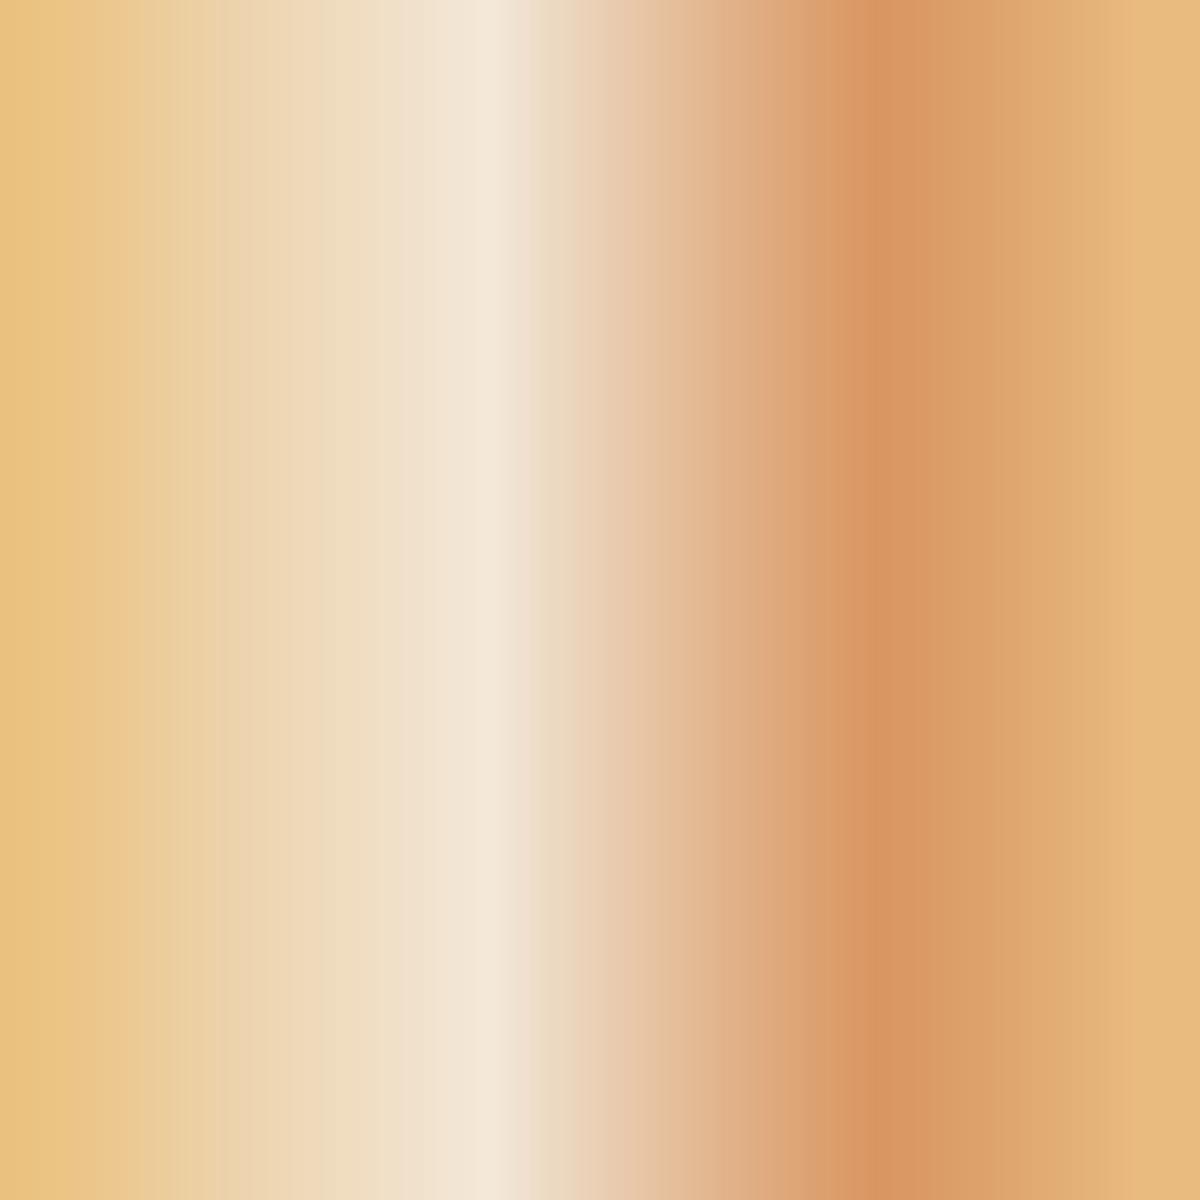 FolkArt ® Brushed Metal™ Acrylic Paint - Pearl Gold, 2 oz. - 5120